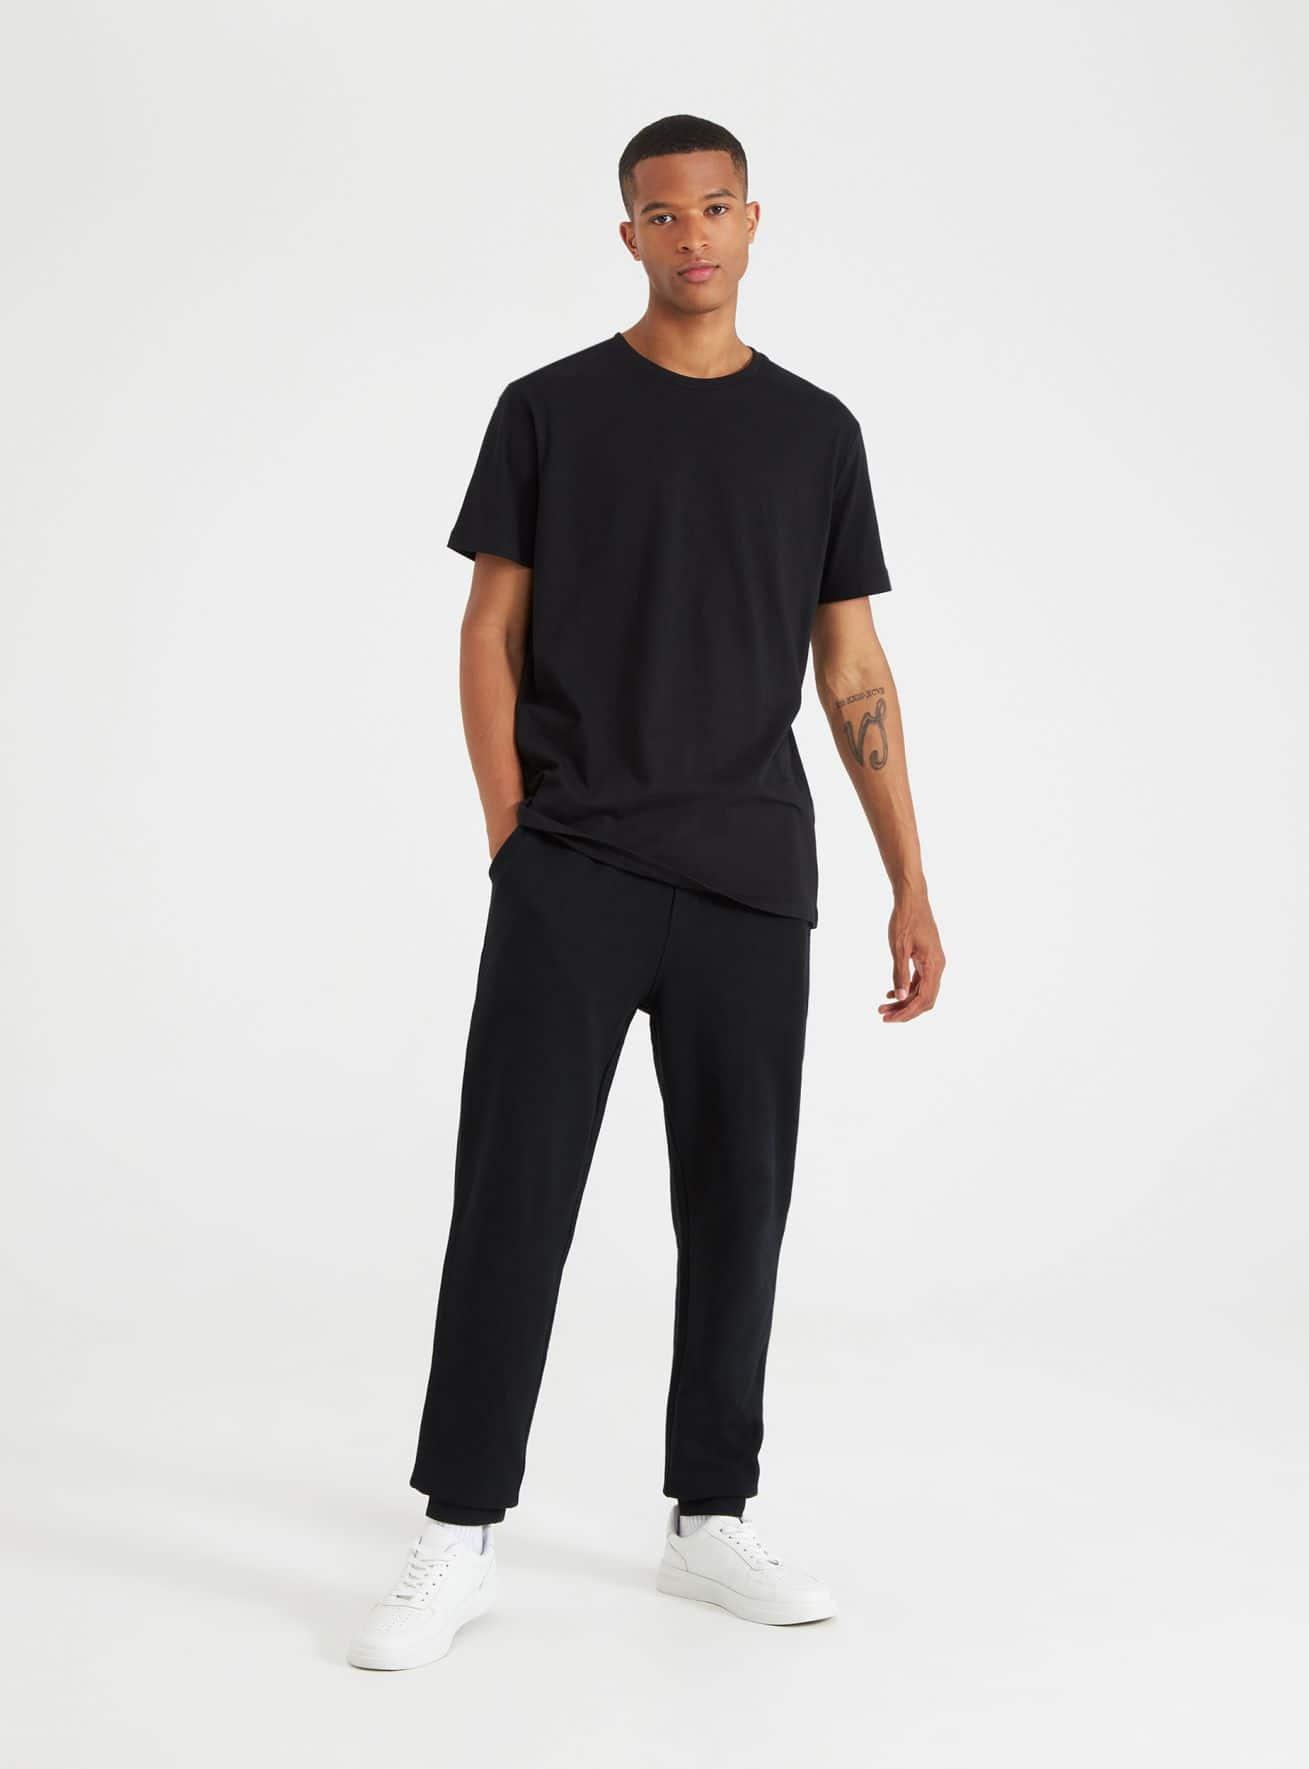 Pantalones Hombre Terranova